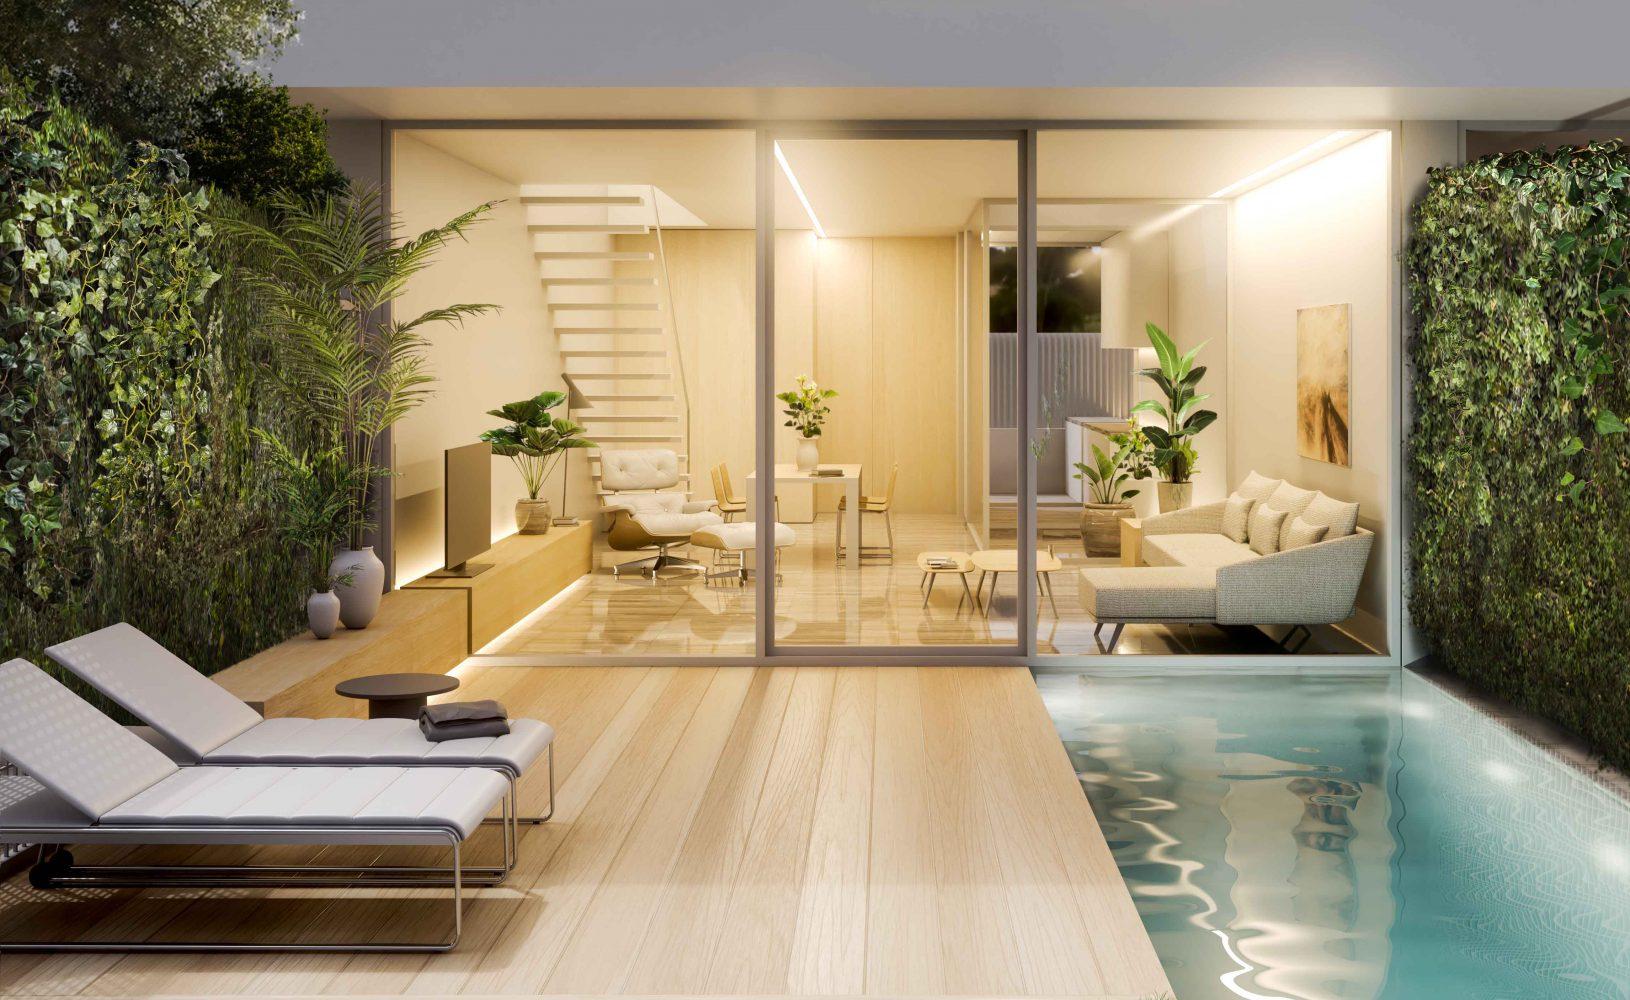 Lecoc arquitectura_arquitecto_valencia_residencialvalenciagolf_torre_conill_viviendas_diseño_02